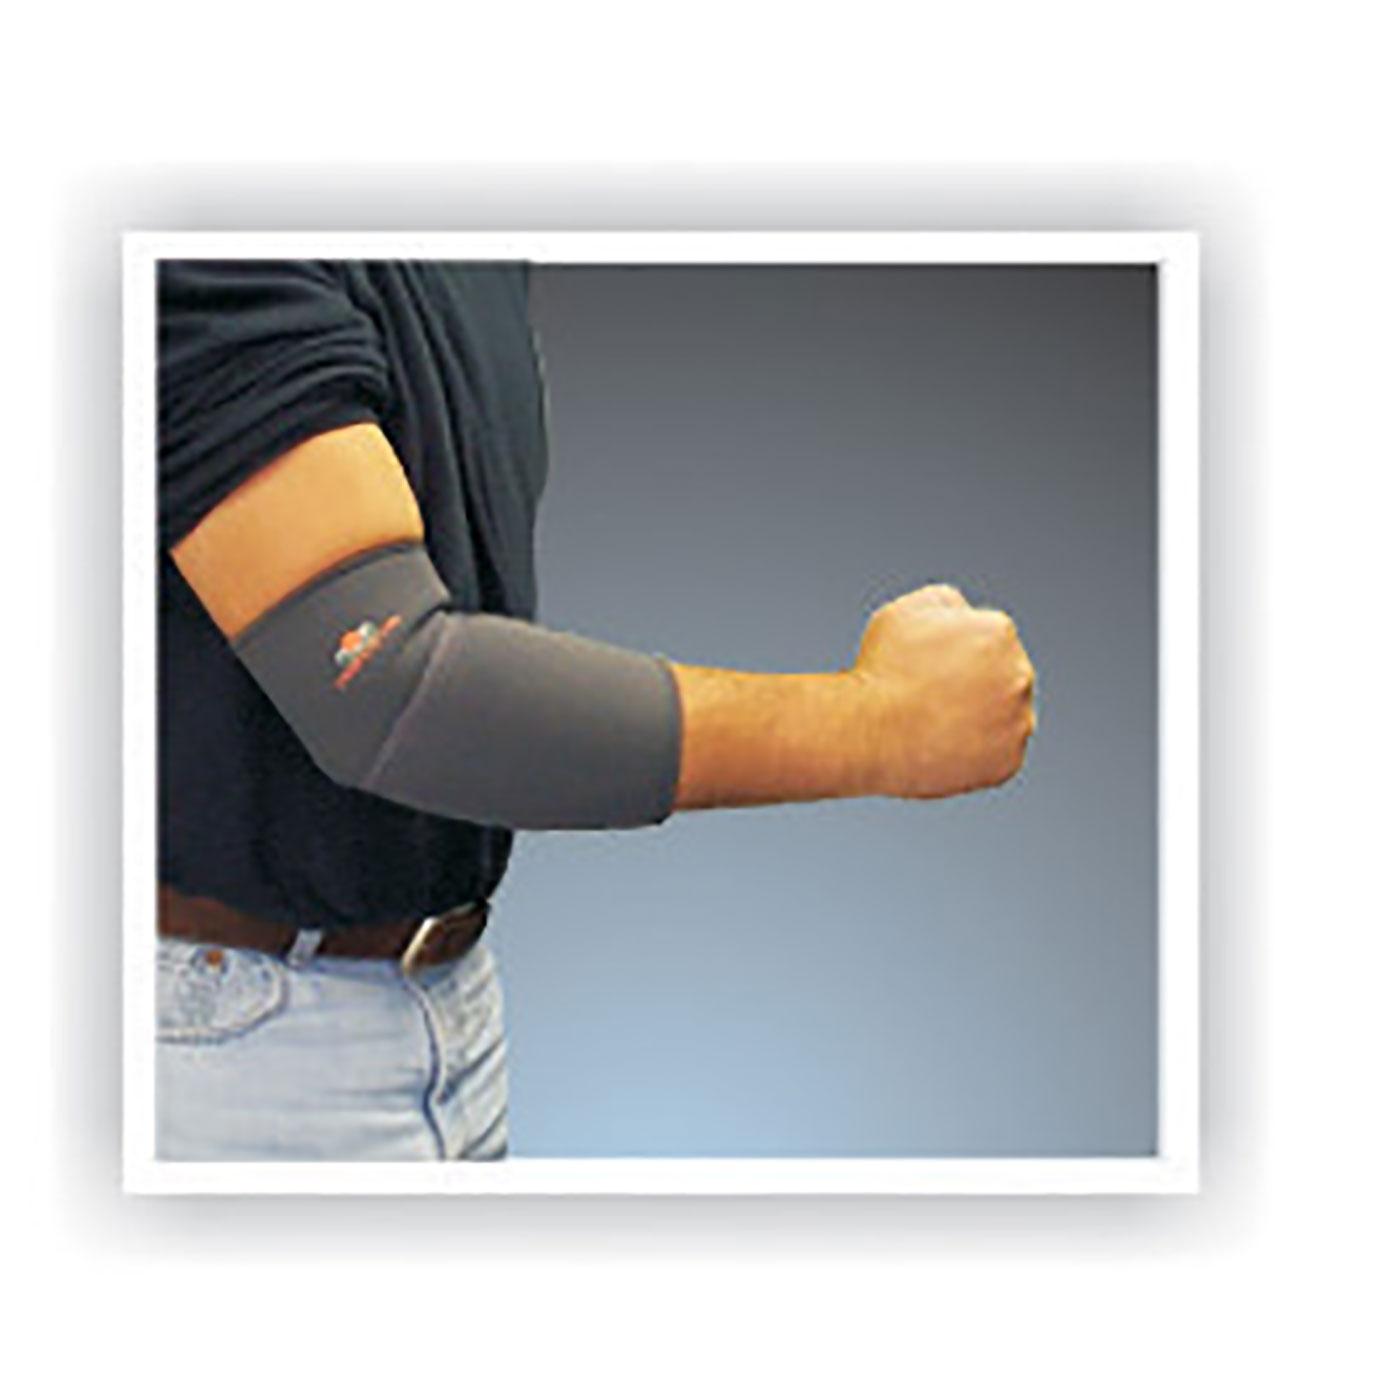 Impacto Wrist/Forearm Support (Forearm)